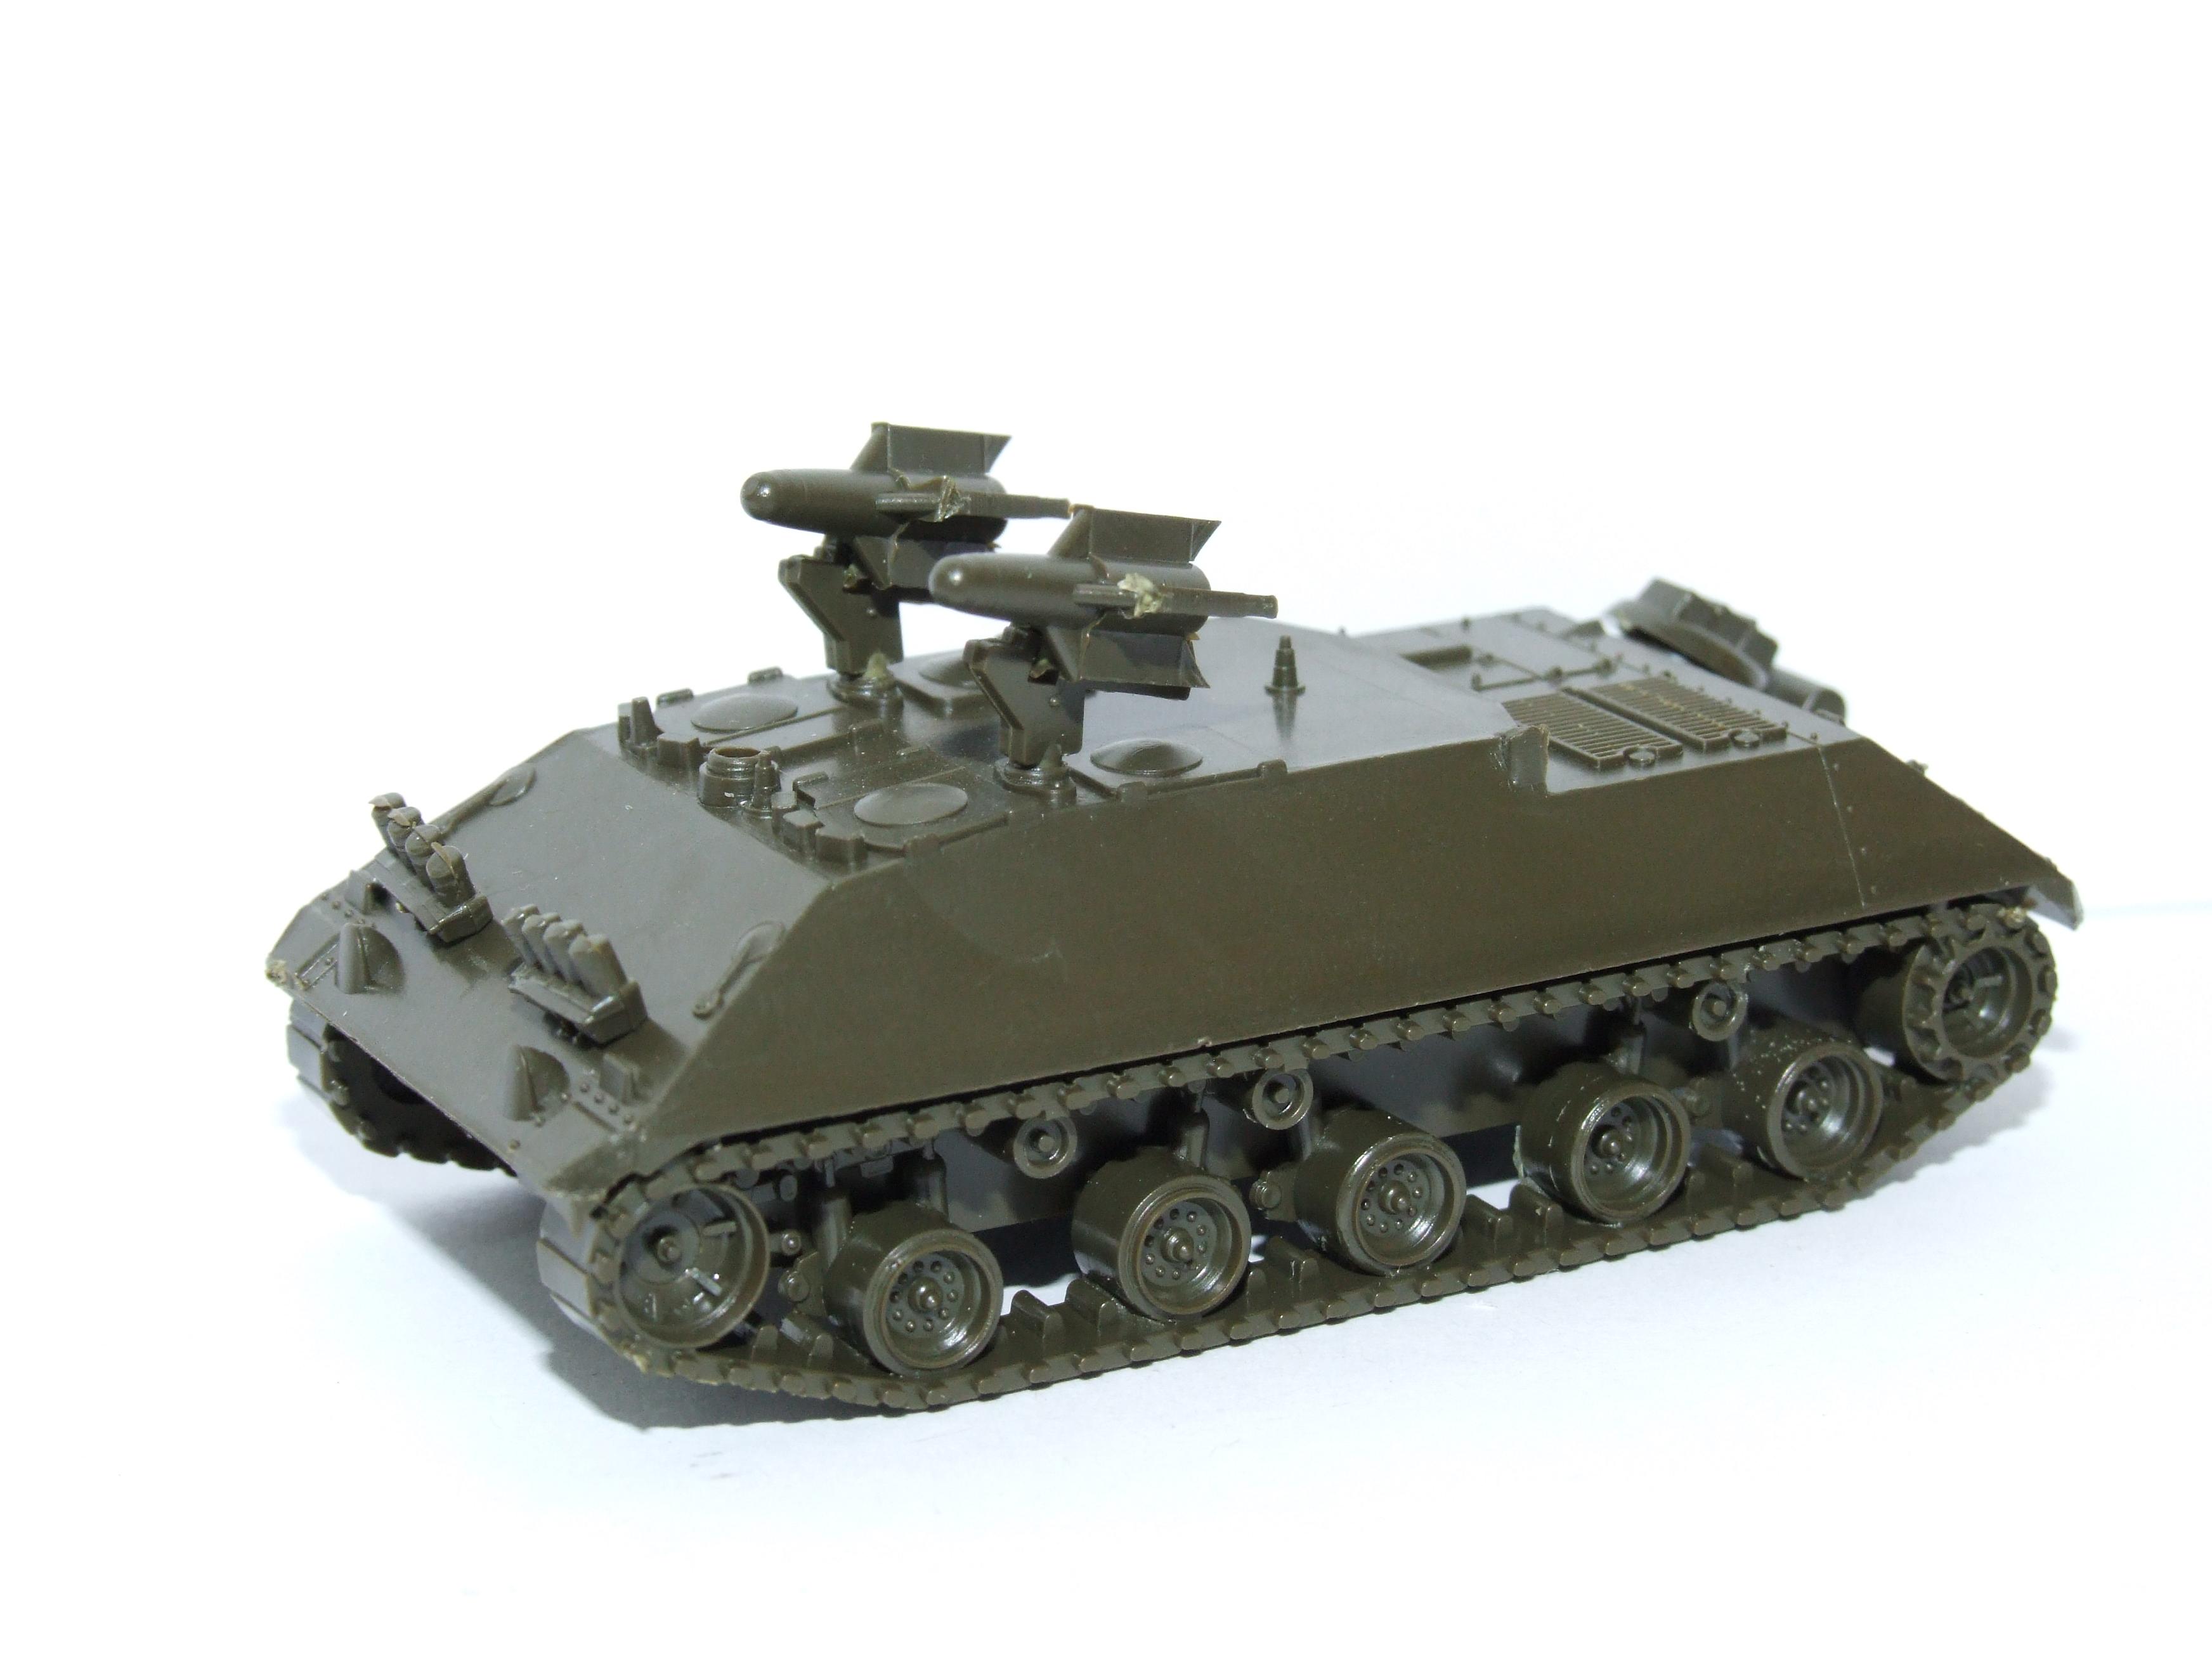 Herpa  741279 Minitanks Raketenjagdpanzer 1 HS 30 Bundeswehr